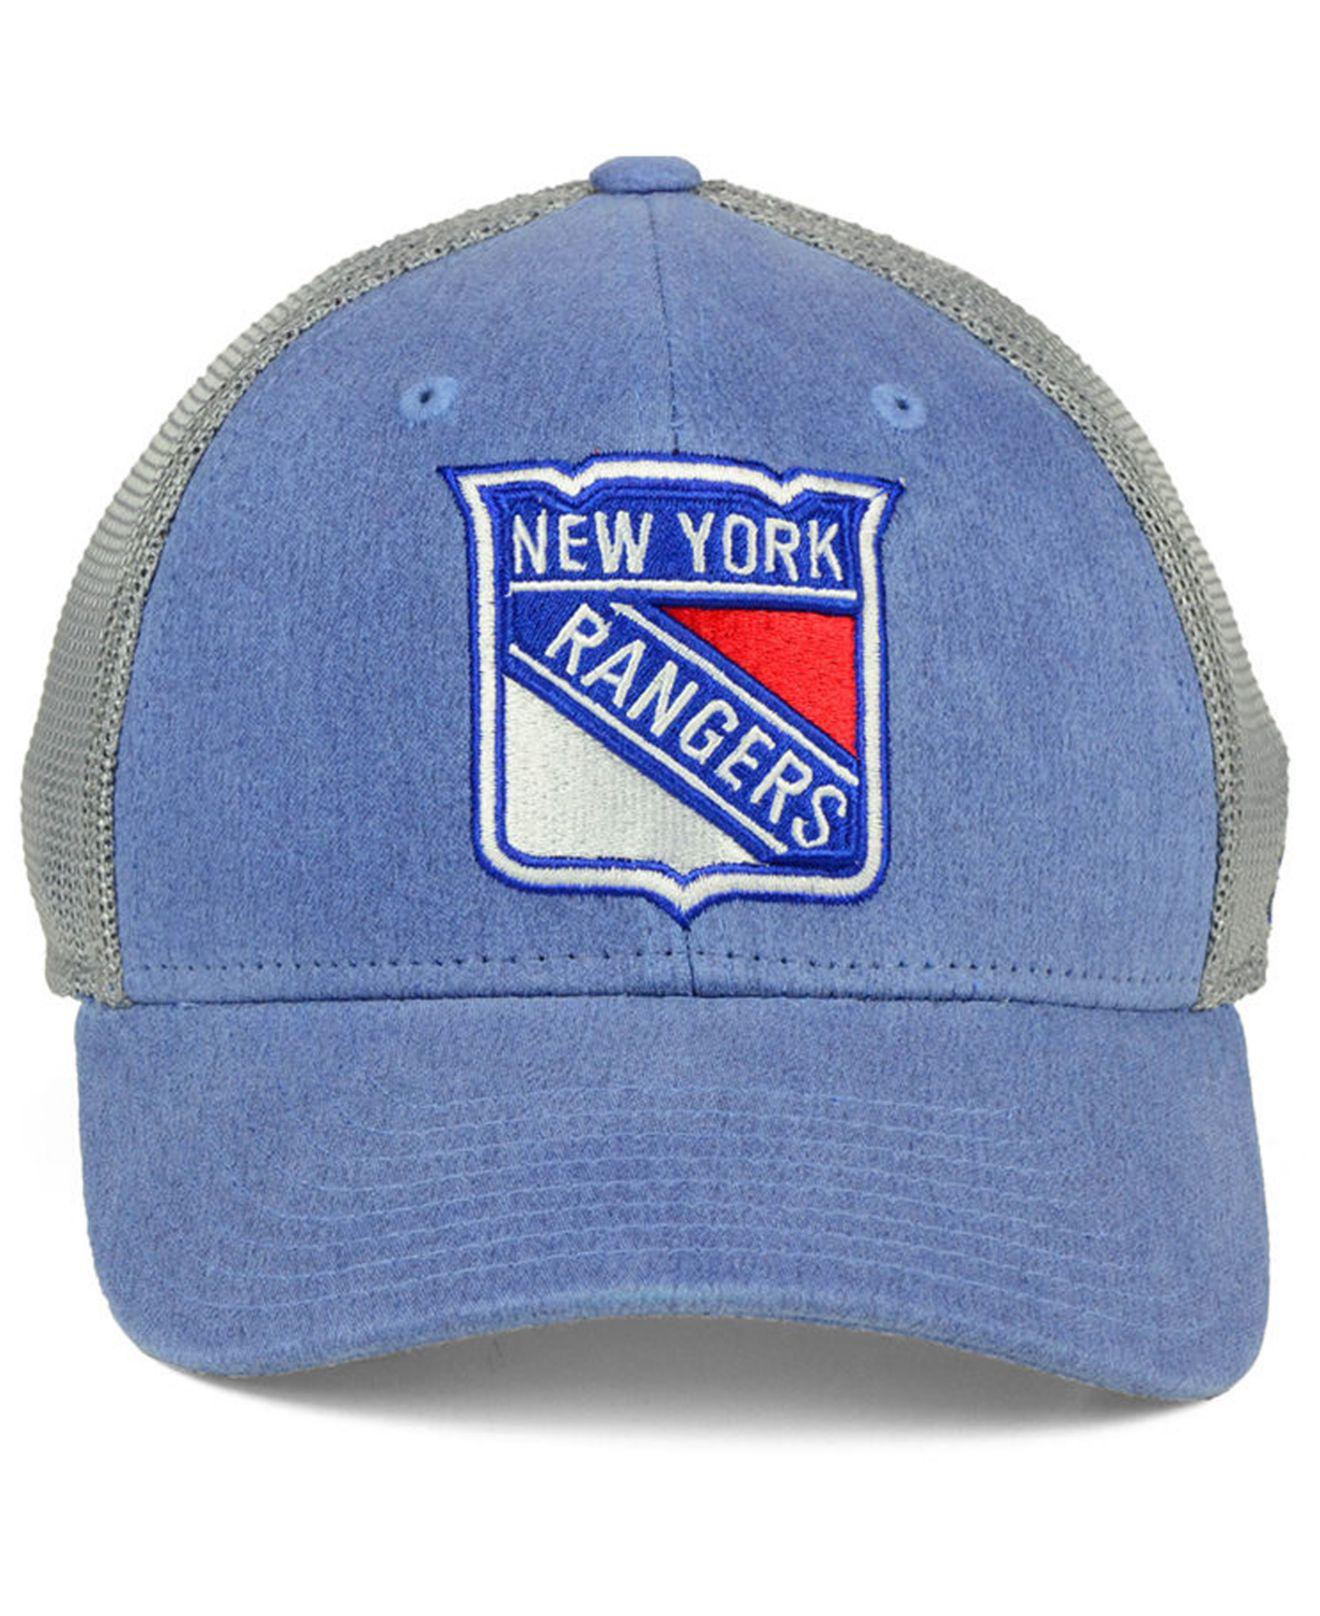 super popular a7bf5 c6730 Lyst - adidas New York Rangers Geno Flex Cap in Blue for Men